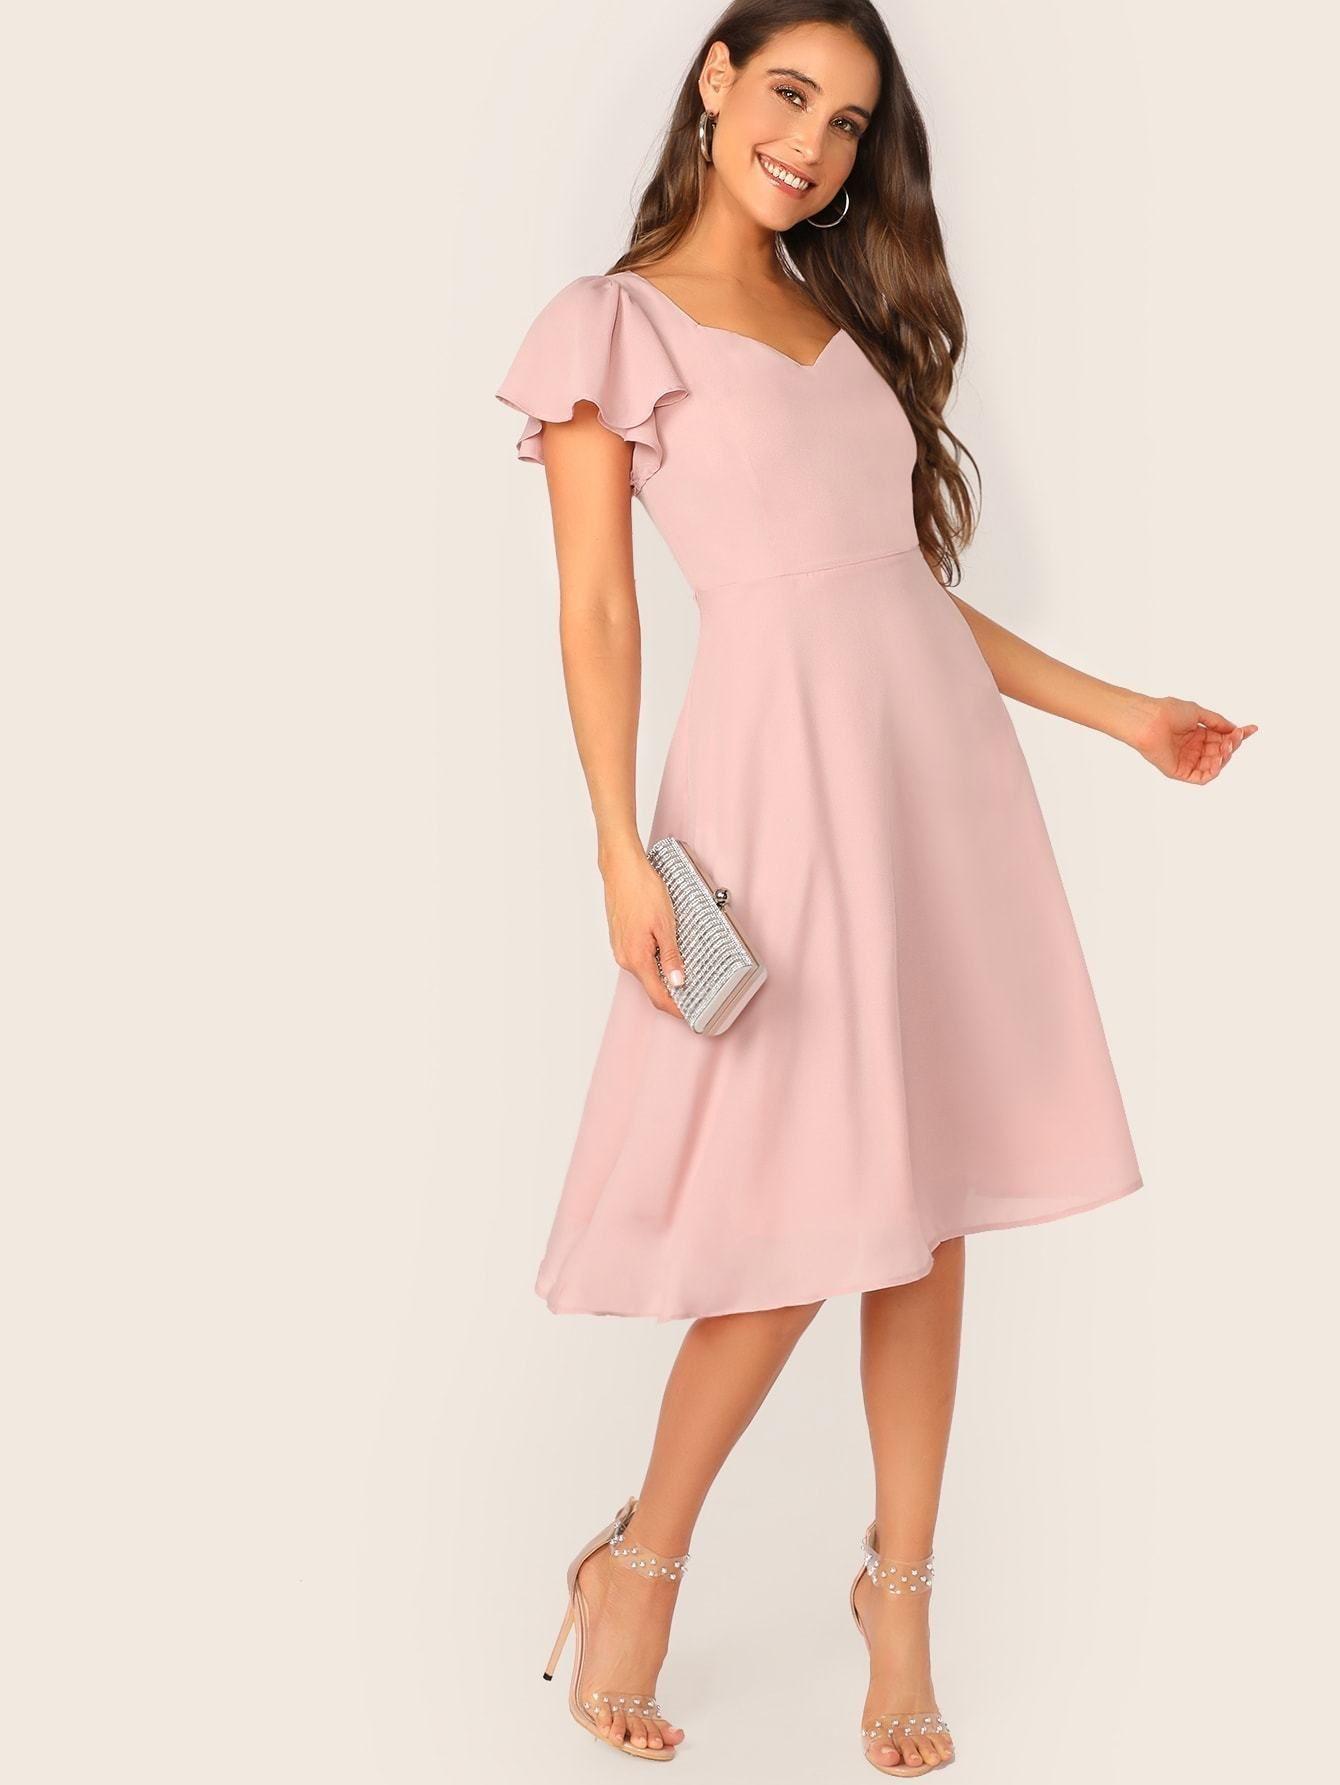 1 Flutter Sleeve Sweetheart Neck Fit Flare Dress Wear24 7 Midi Dress With Sleeves Flare Dress Fit Flare Dress [ 1785 x 1340 Pixel ]